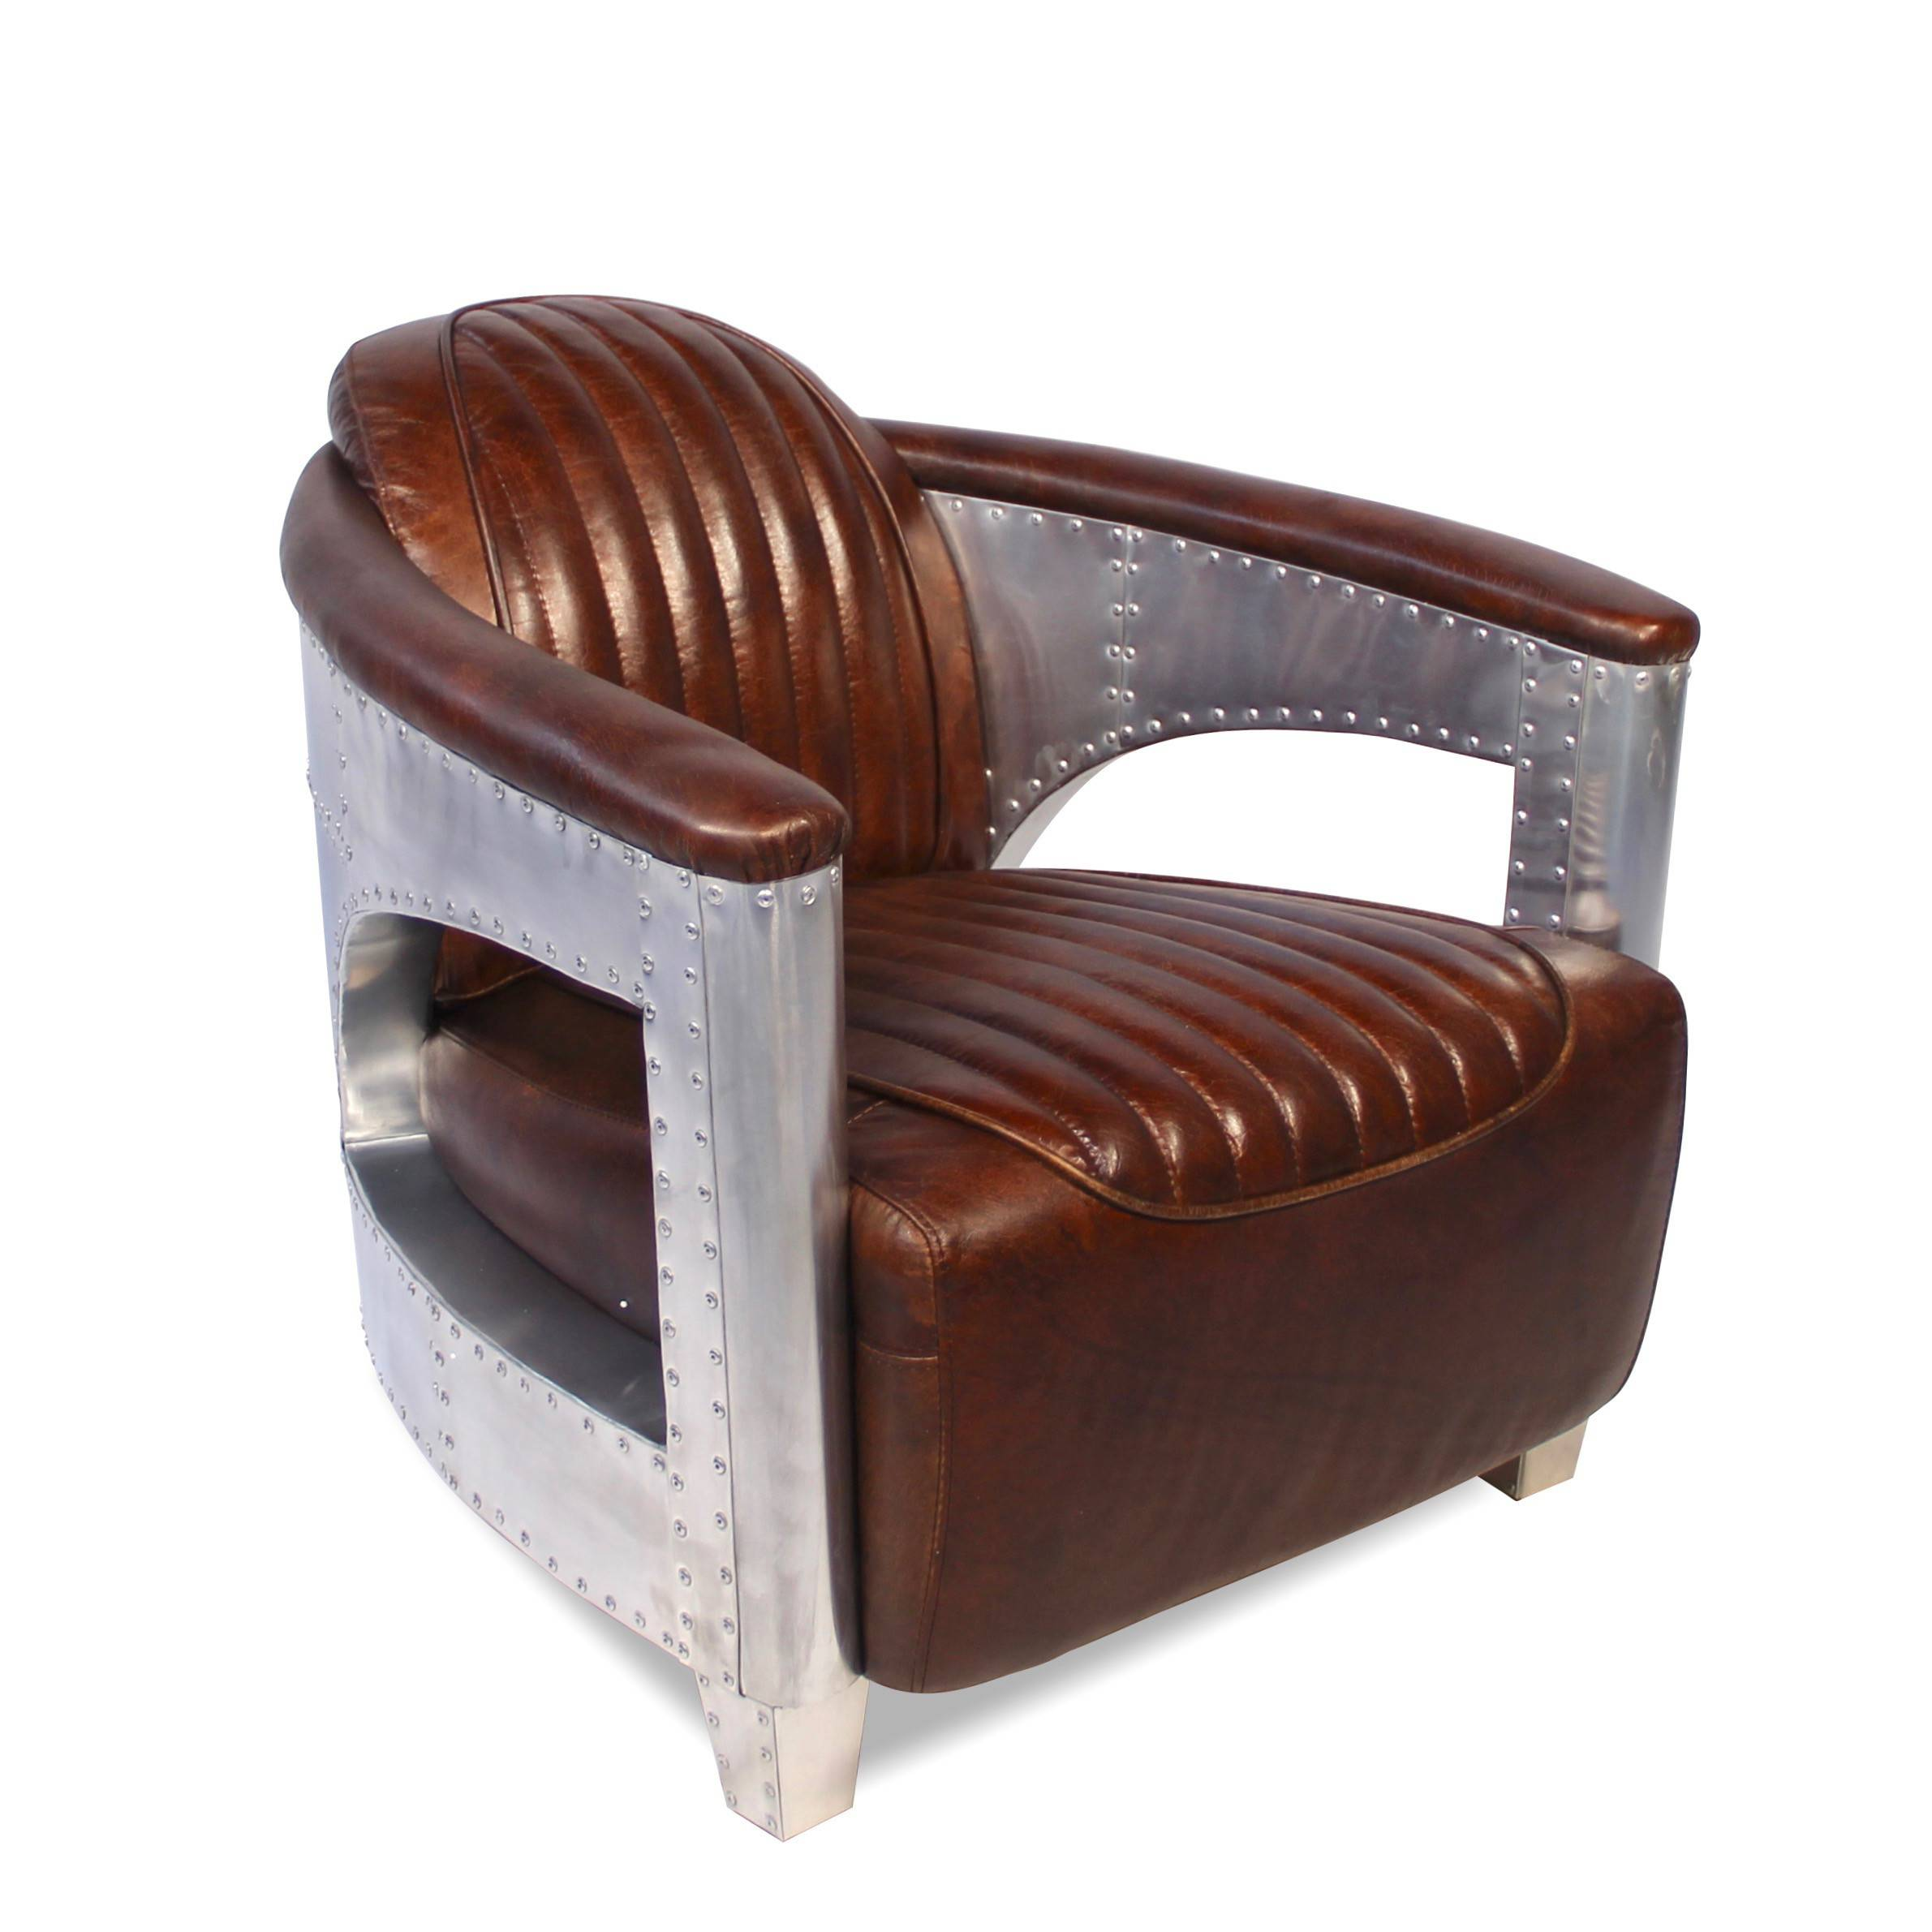 ledersessel aviator patina braun vintage und aluminium genietet. Black Bedroom Furniture Sets. Home Design Ideas